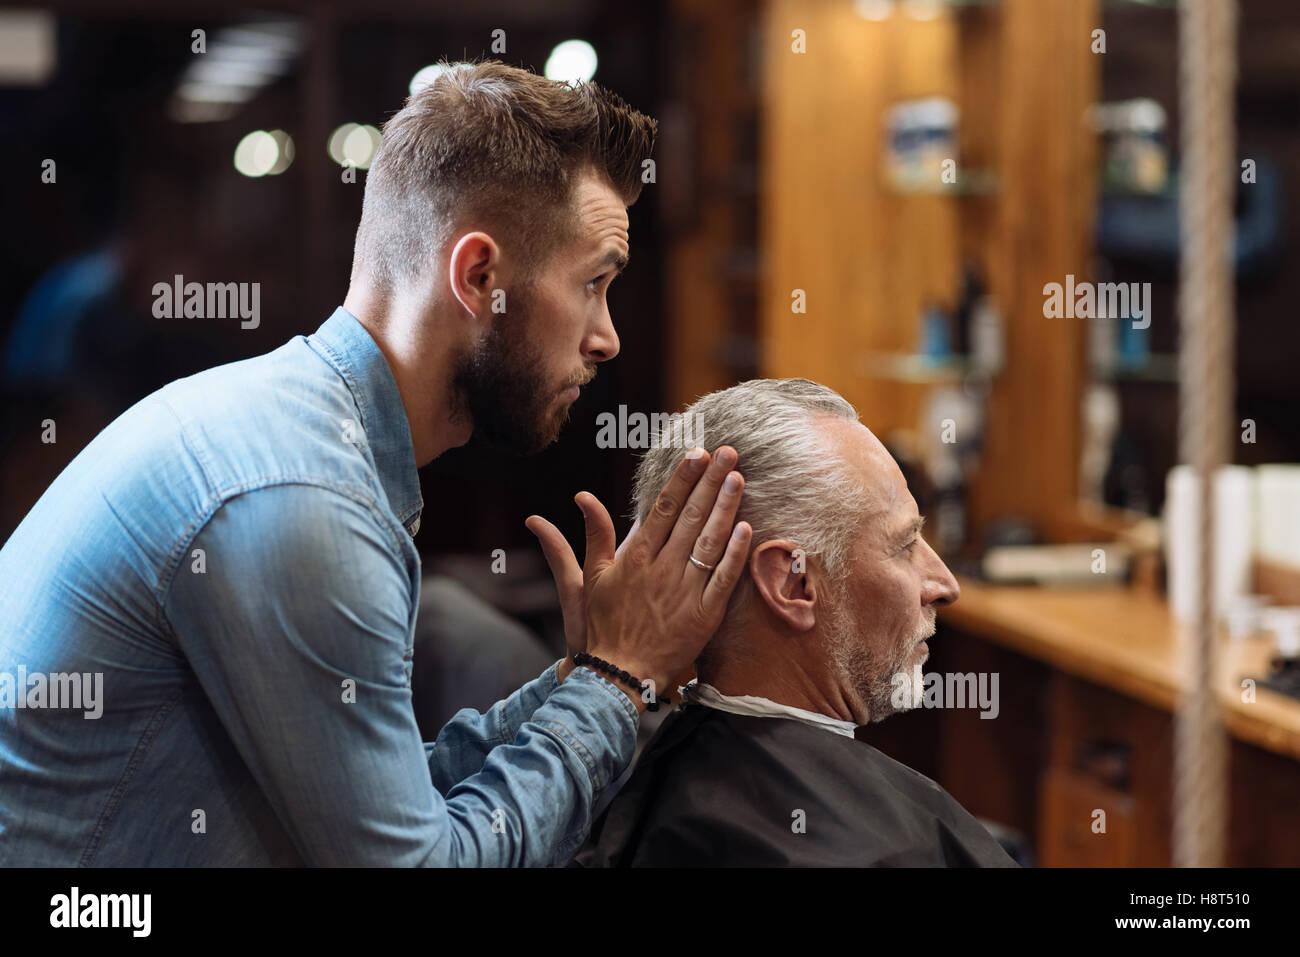 Beau salon de coiffure styling hair man Photo Stock